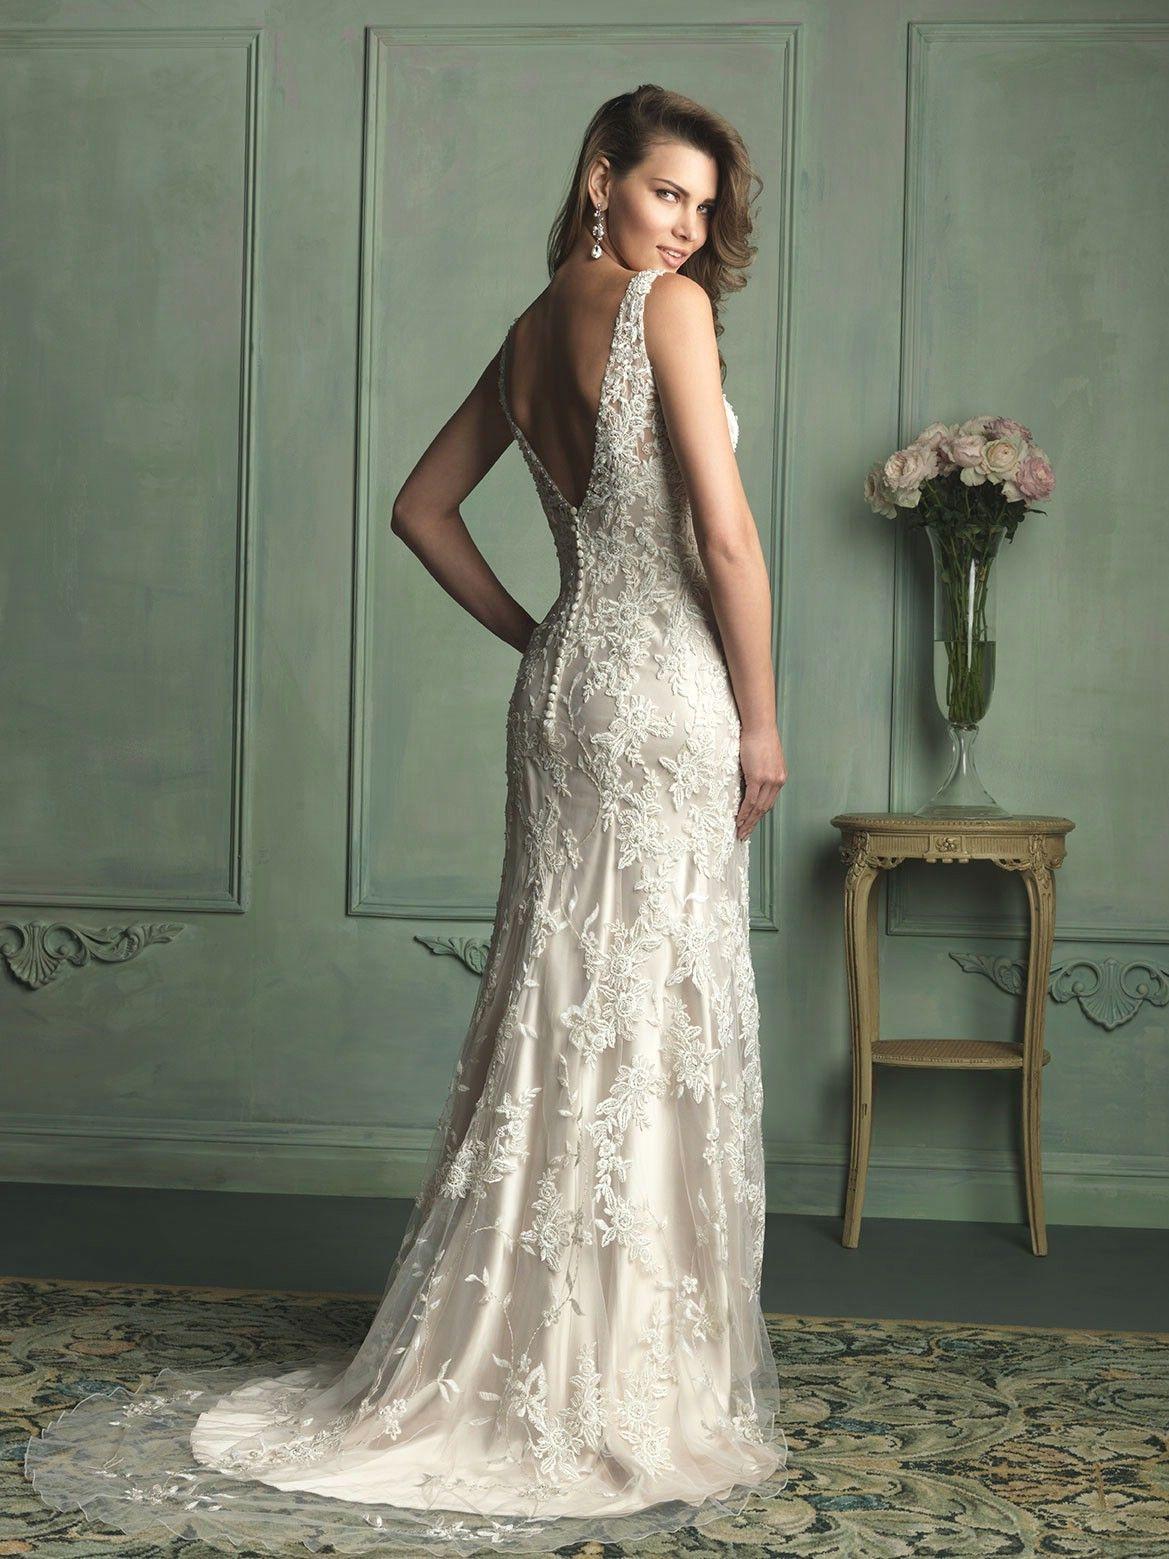 Allure wedding dresses style wedding dress pinterest